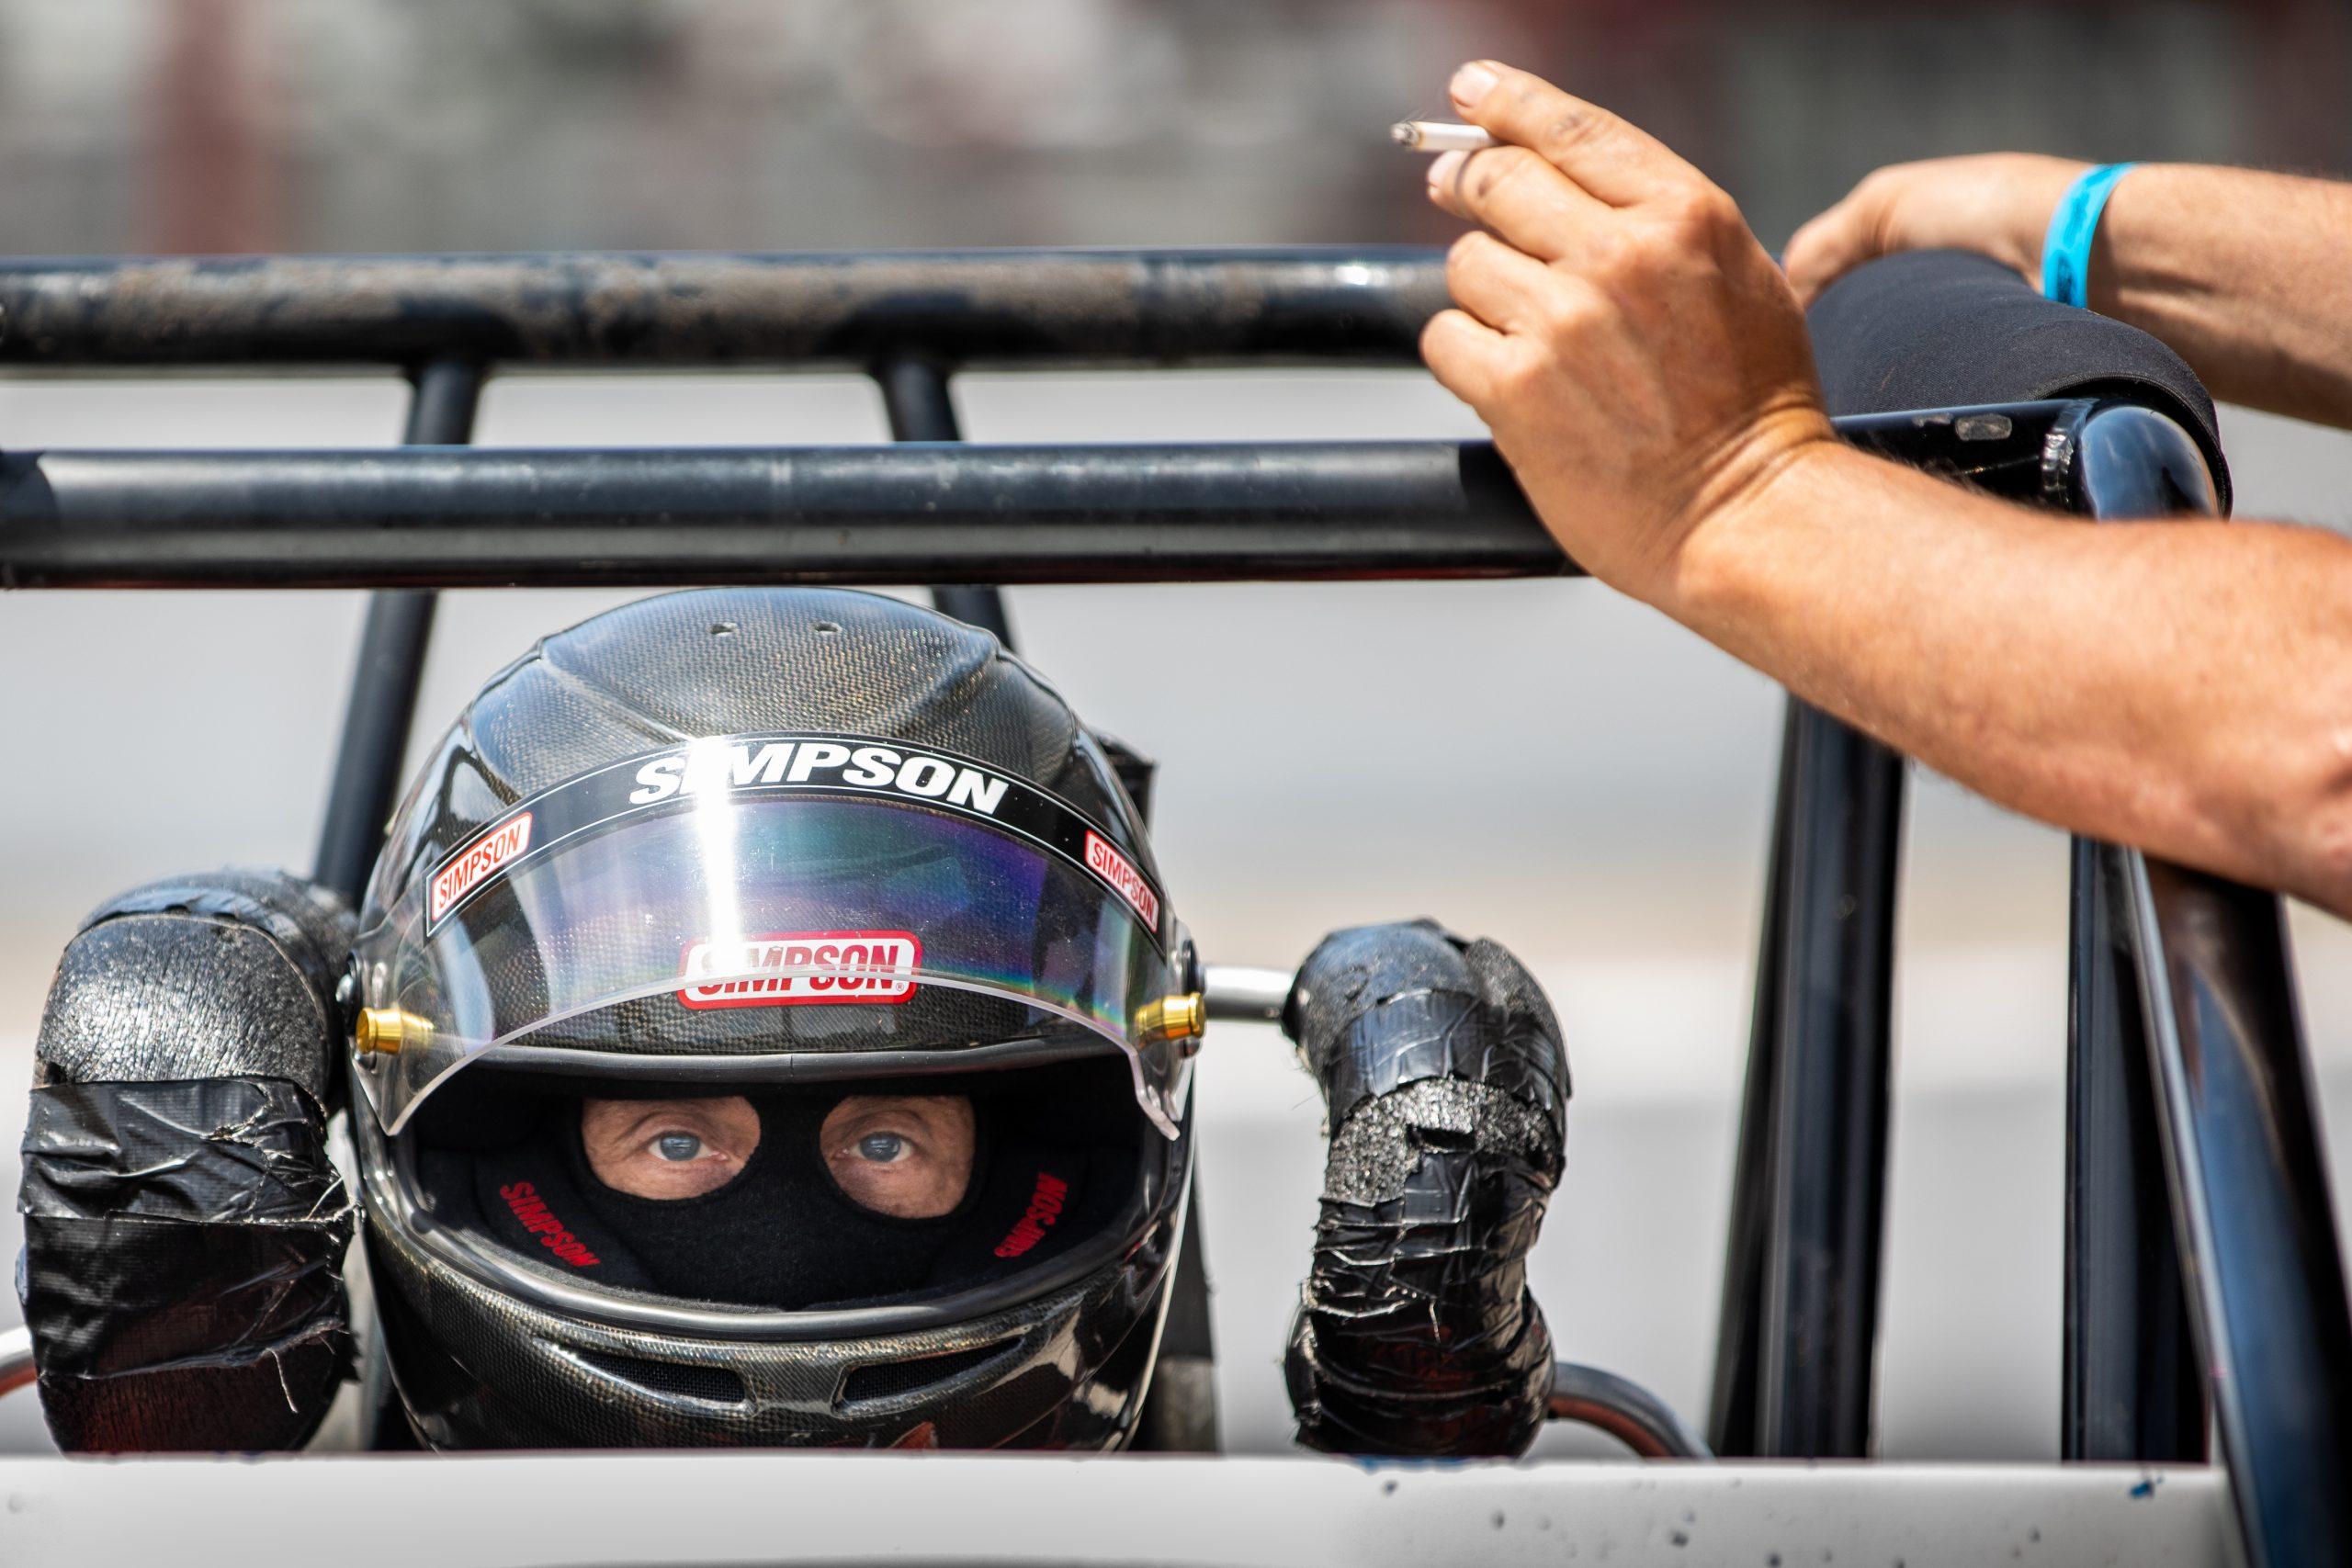 racecar driver simpson ready in cockpit near cigarette pit hand